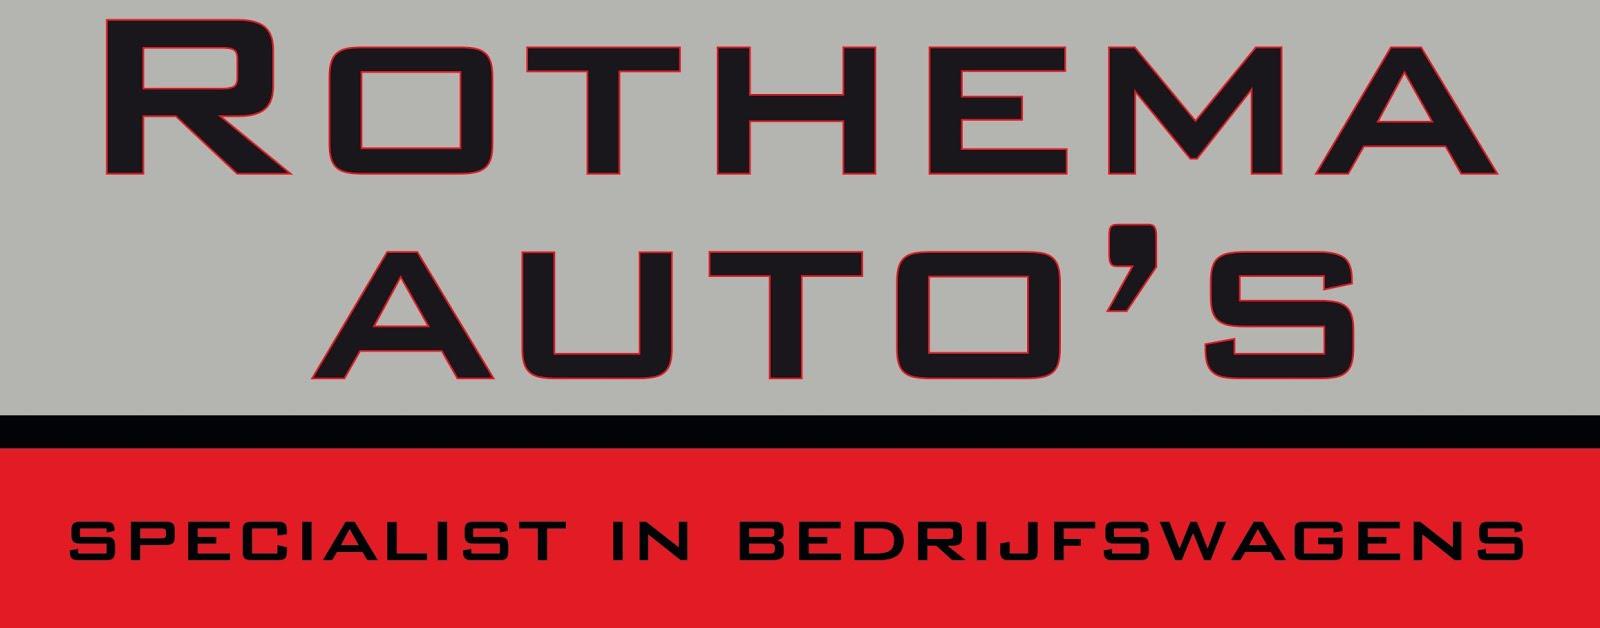 Sponsor Rothema Auto's